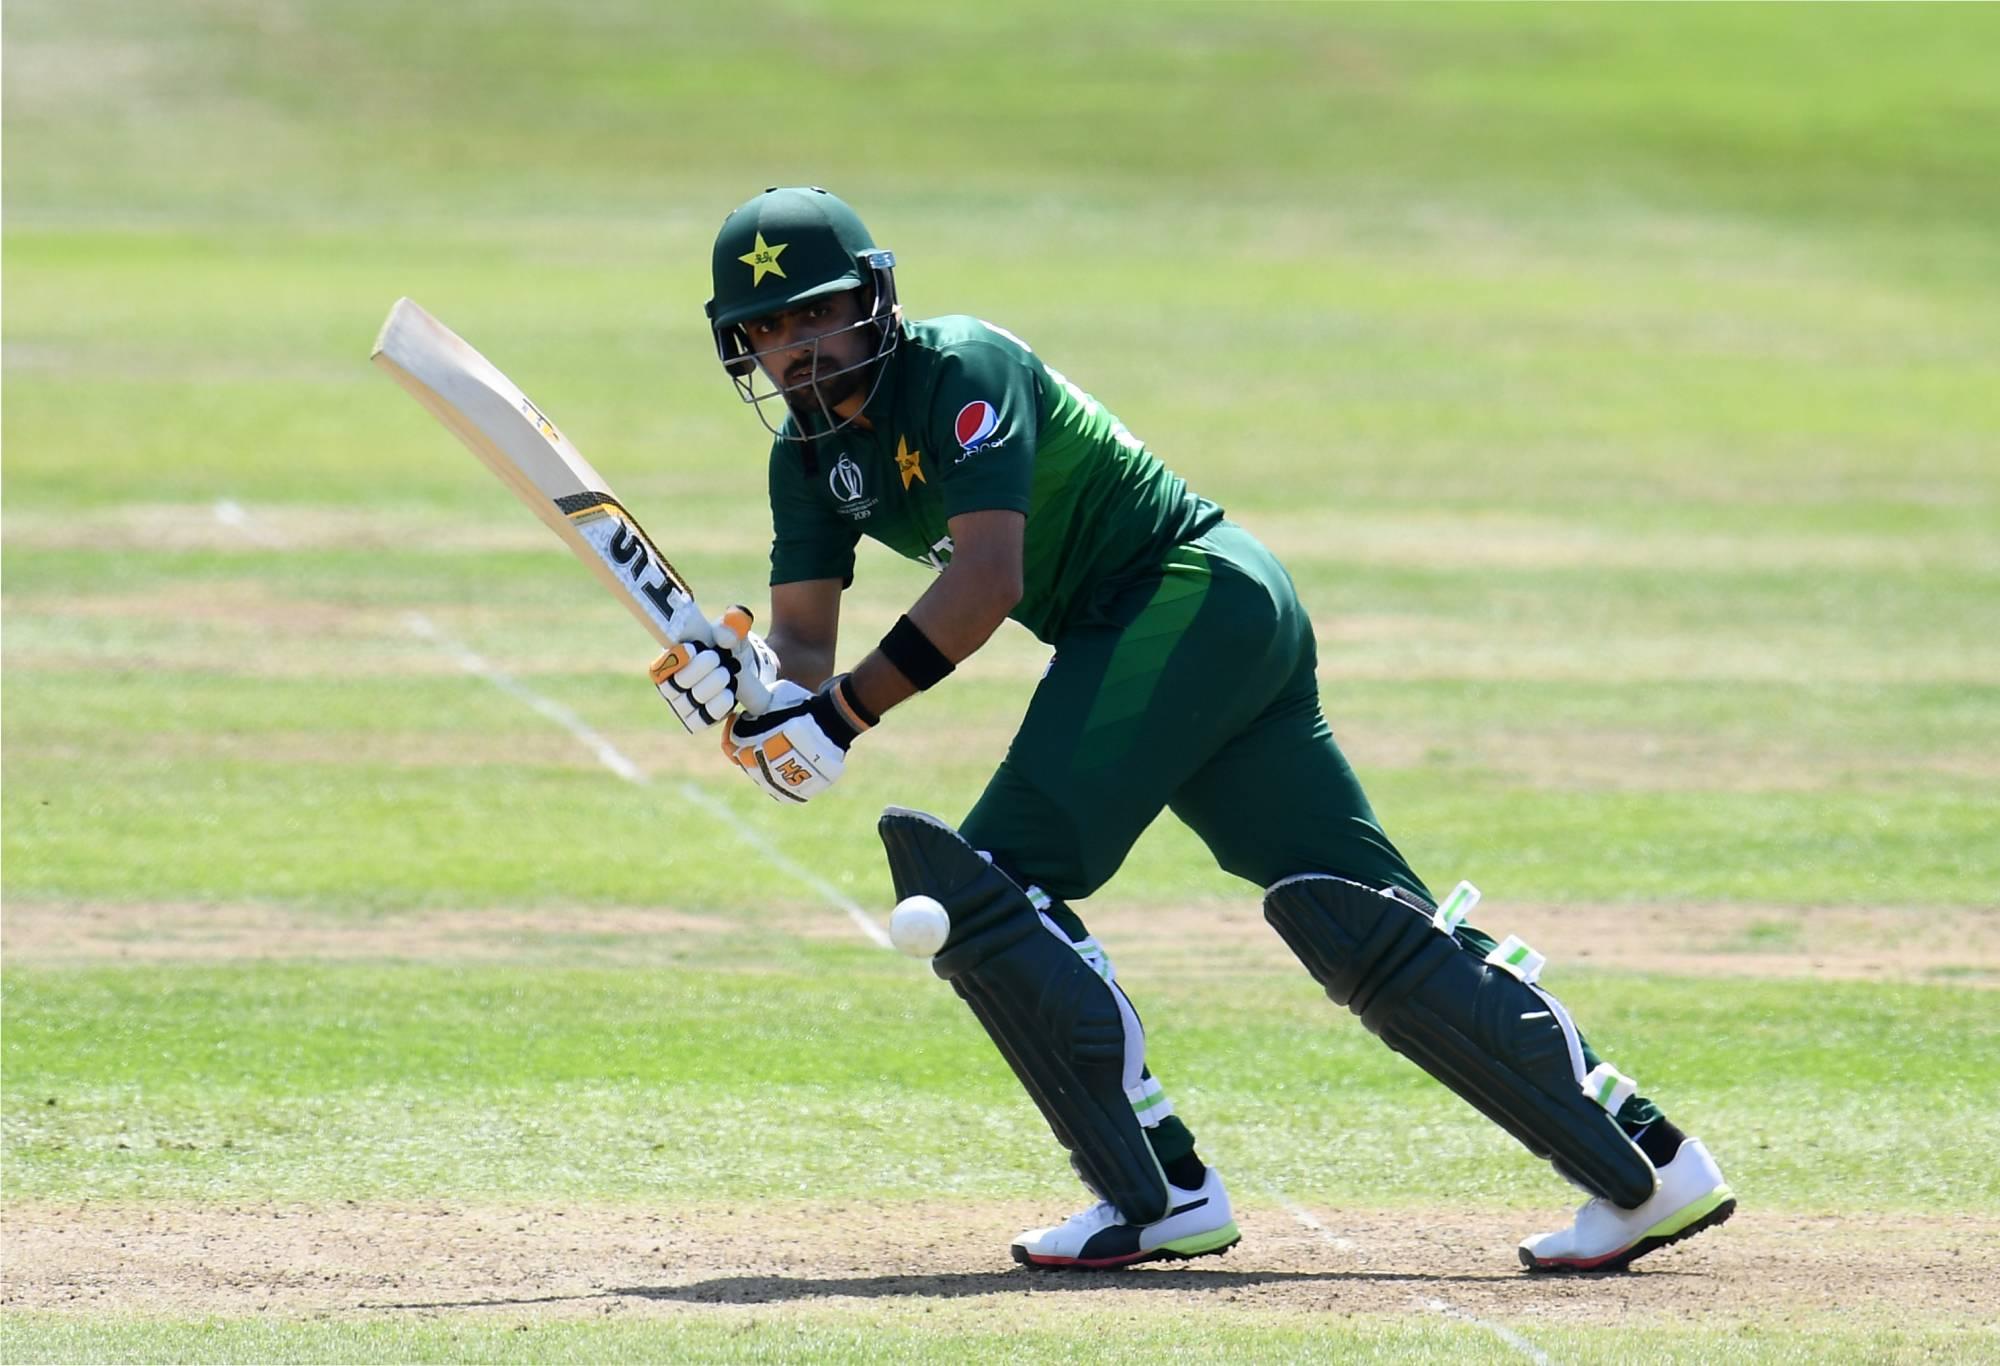 Babar Azam batting for Pakistan